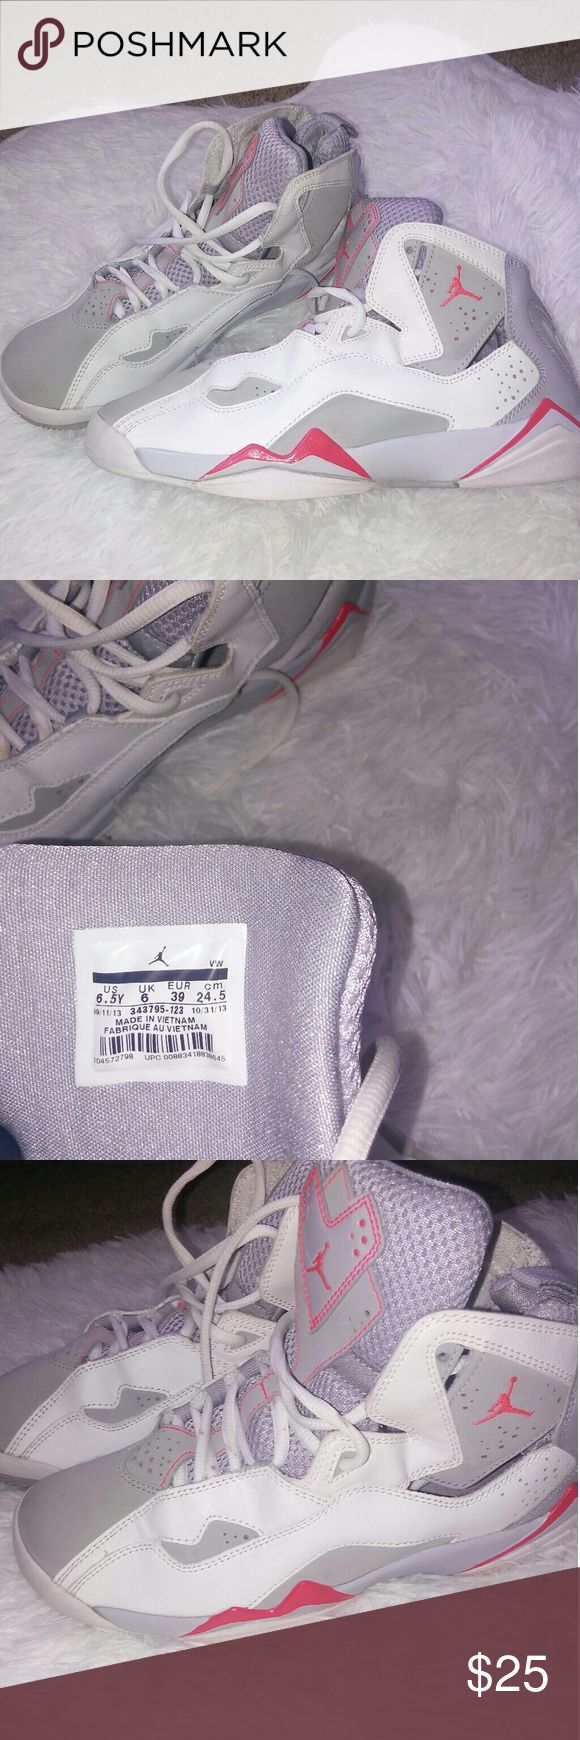 Nike Air Jordan True Flights kids 6.5 Kids Nike air Jordan True Flight coral/gray & white size 6.5 *used* good condition no rips tears or stains...smoke/pet free home Nike air jordan Shoes Sneakers